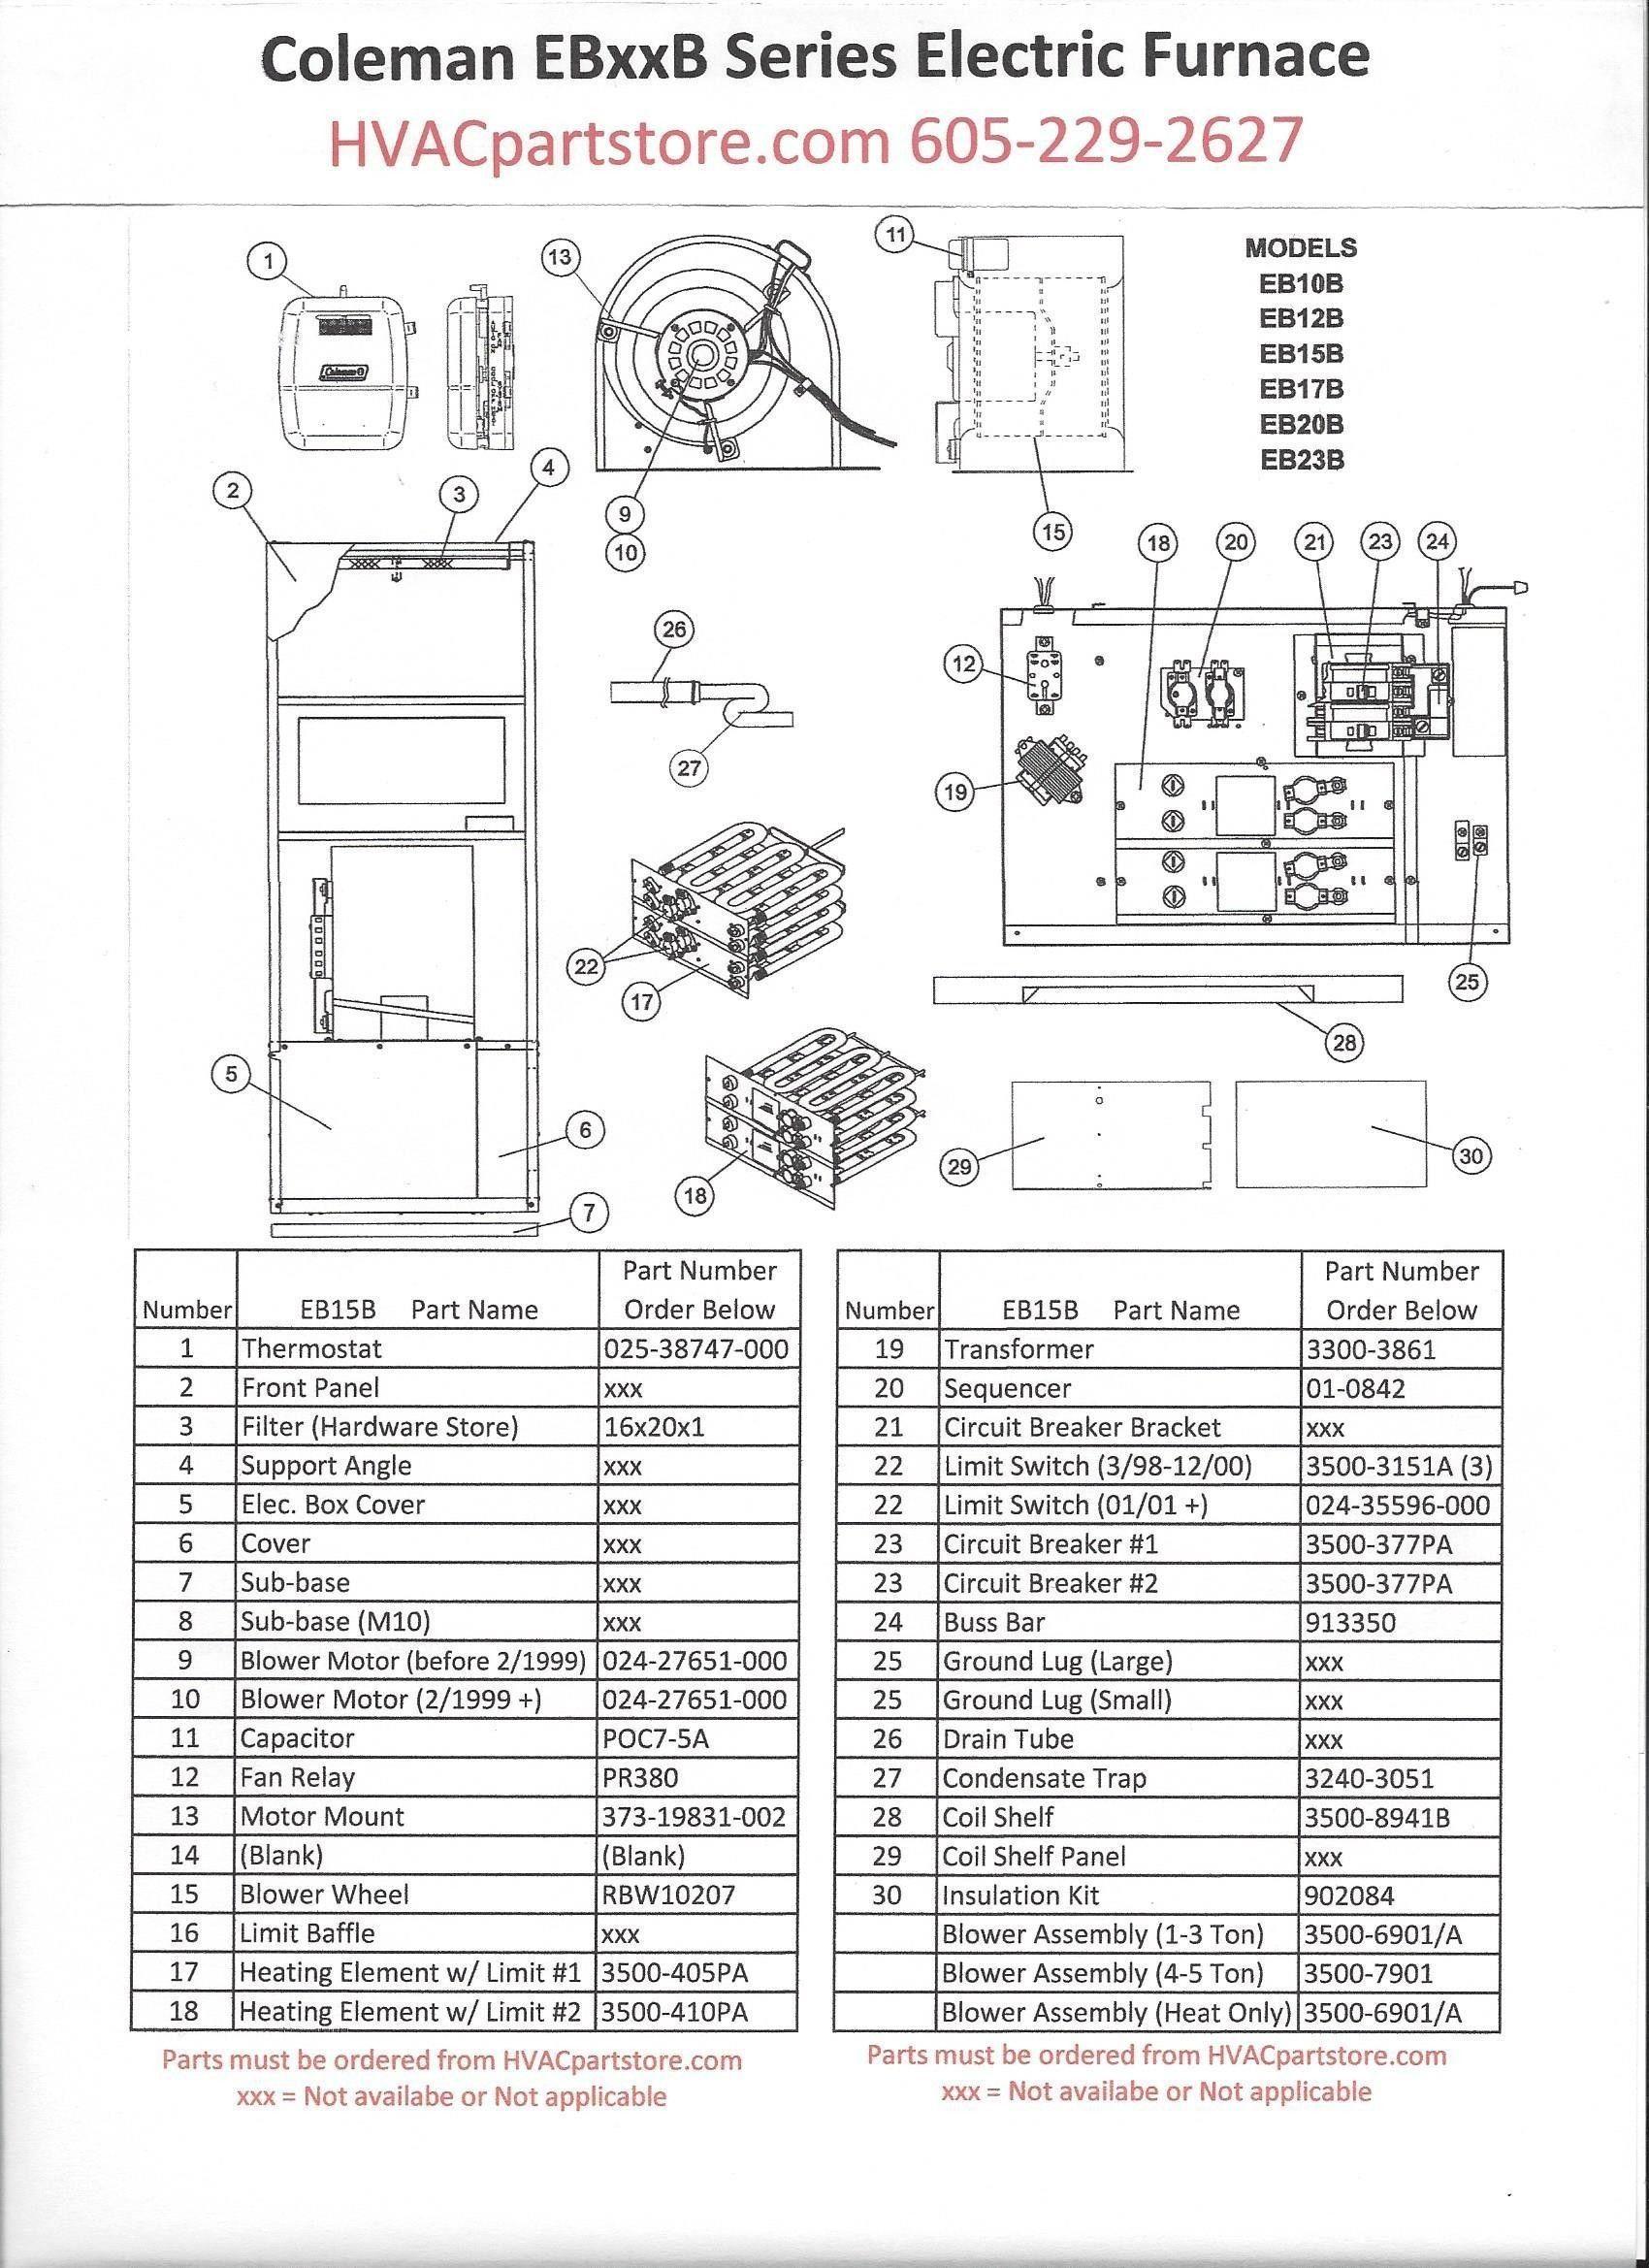 [DIAGRAM] Get Inspired At Lbcc Wiring Diagram FULL Version